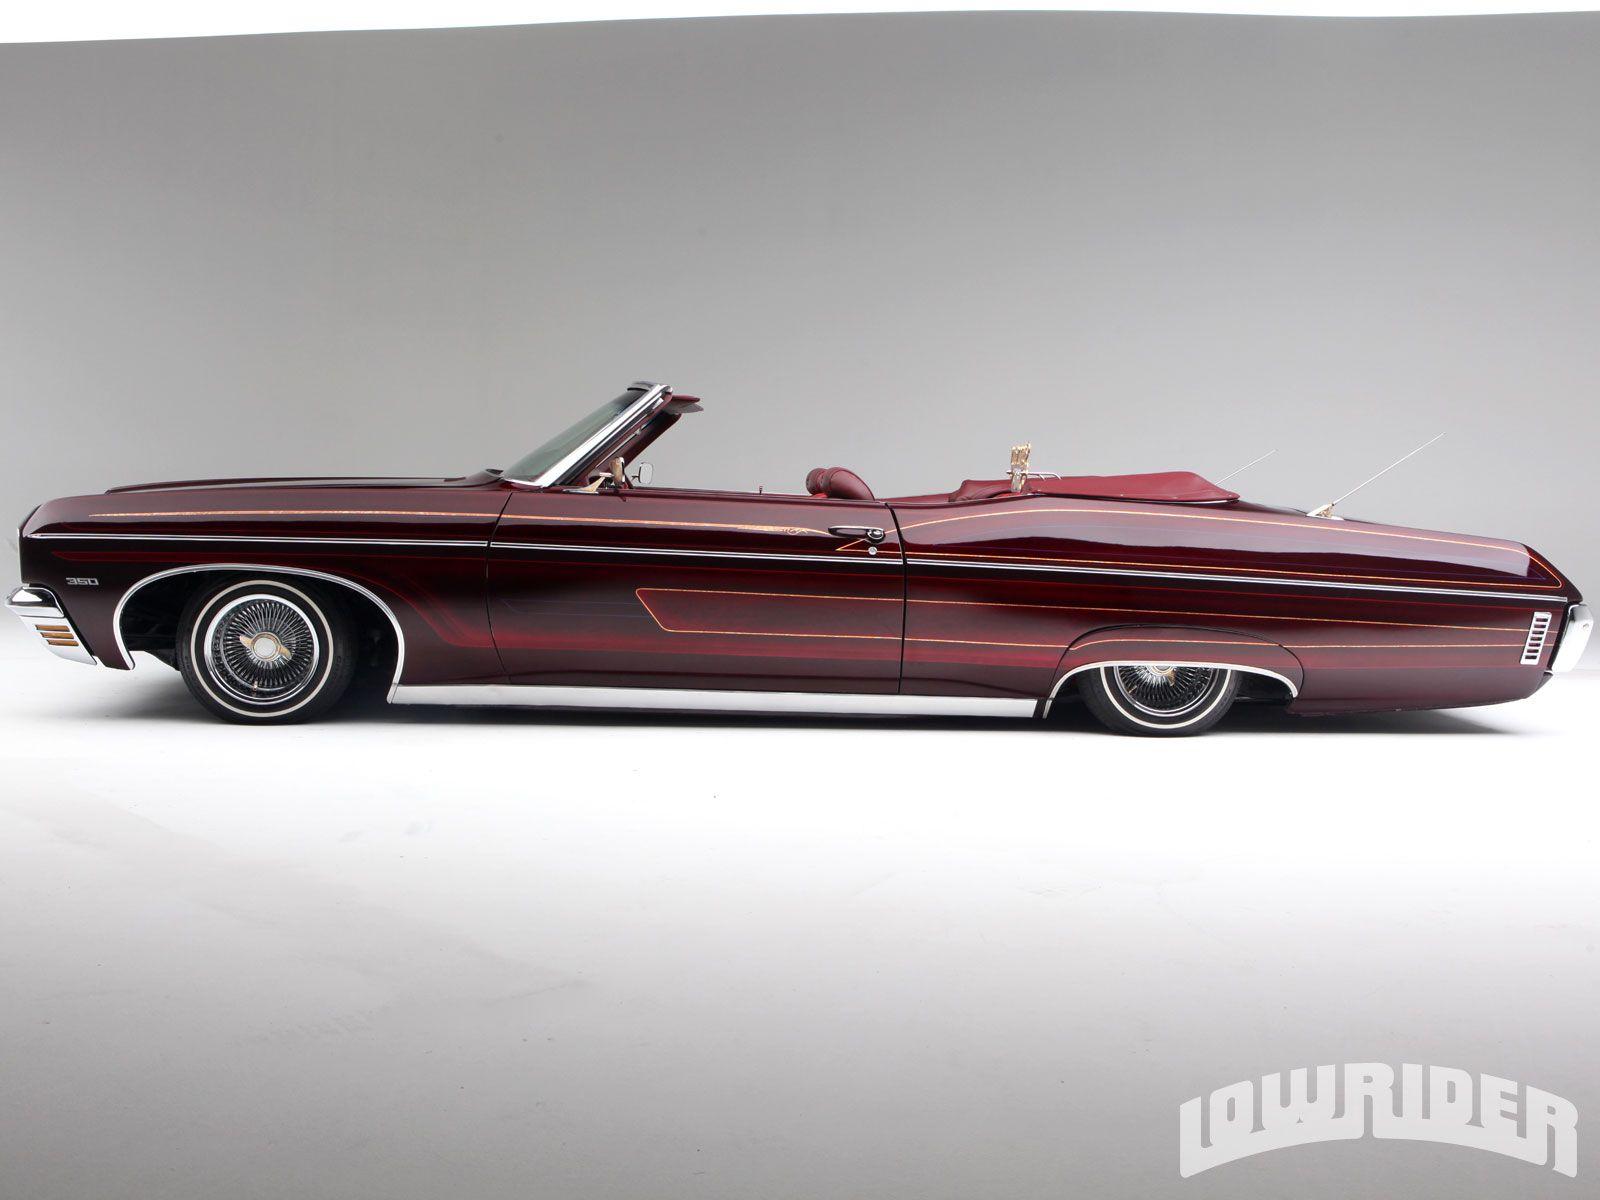 1970 chevrolet impala convertible sexy lowriders pinterest 1970 chevrolet impala convertible sciox Images